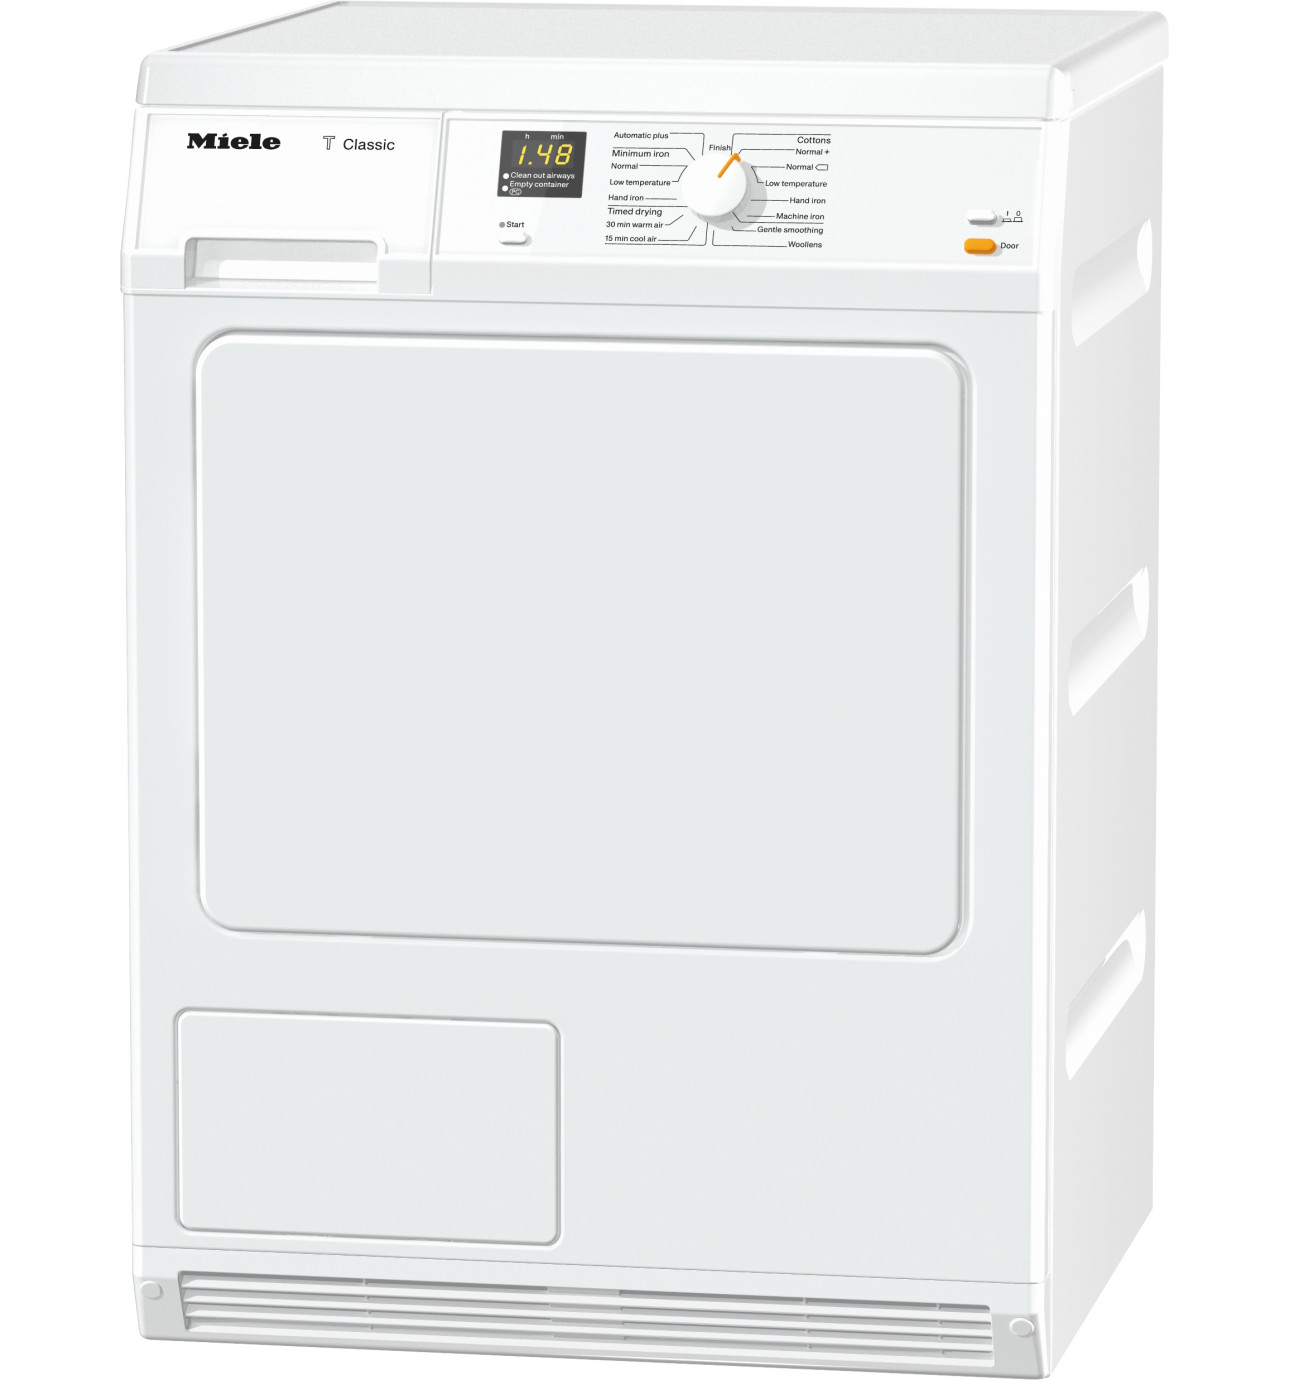 Appliances Dryers Washing Machines Buy Your Washing And Dryer Machine David Jones